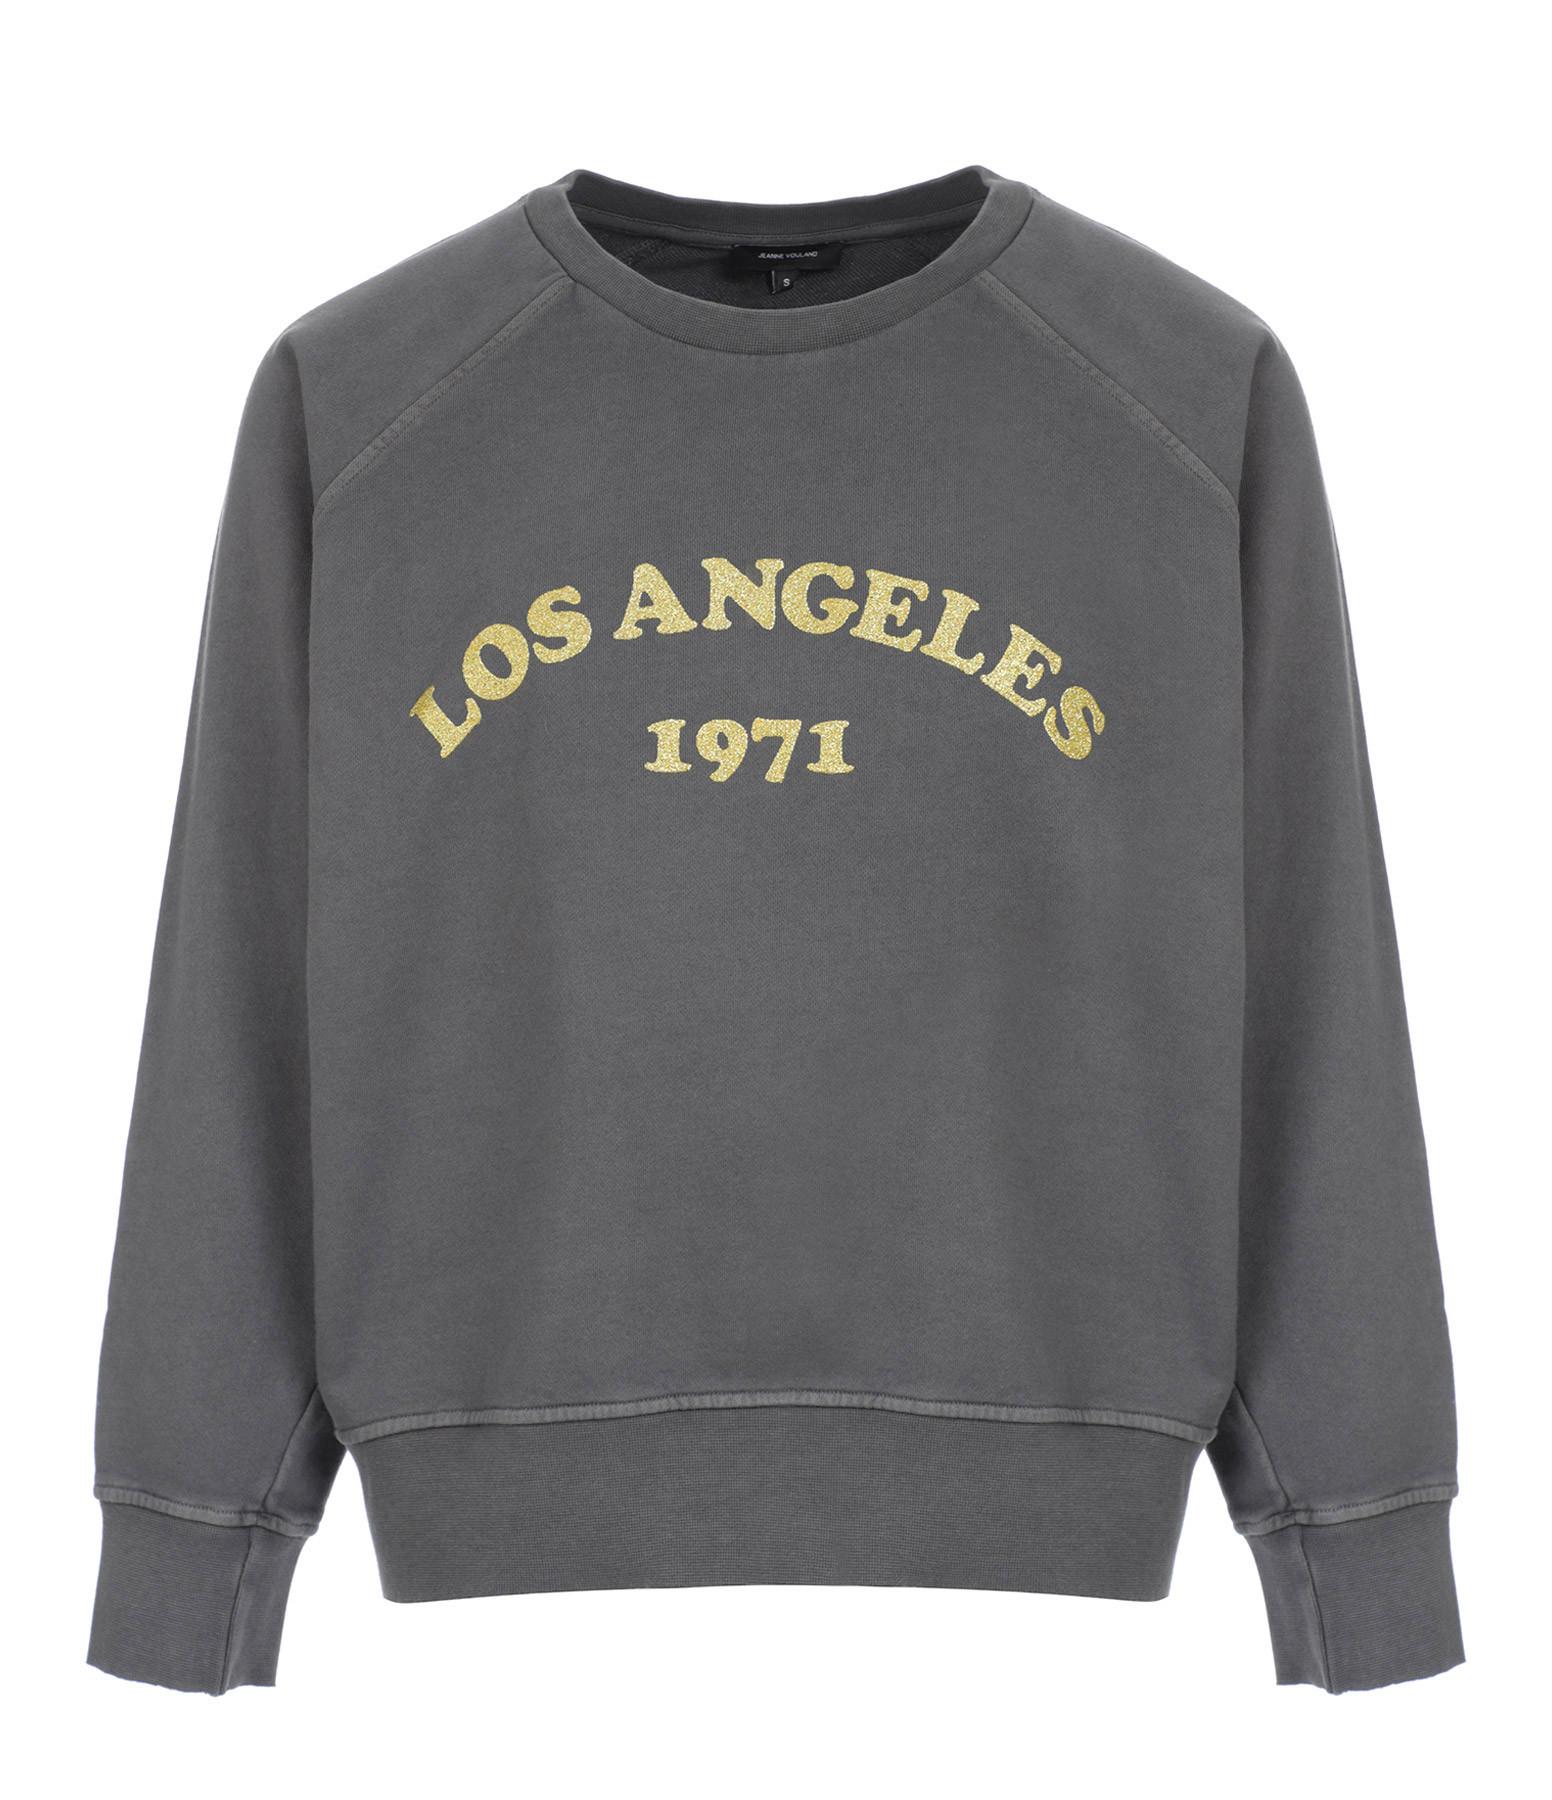 JEANNE VOULAND - Sweatshirt Fail Los Angeles Glitter Gris